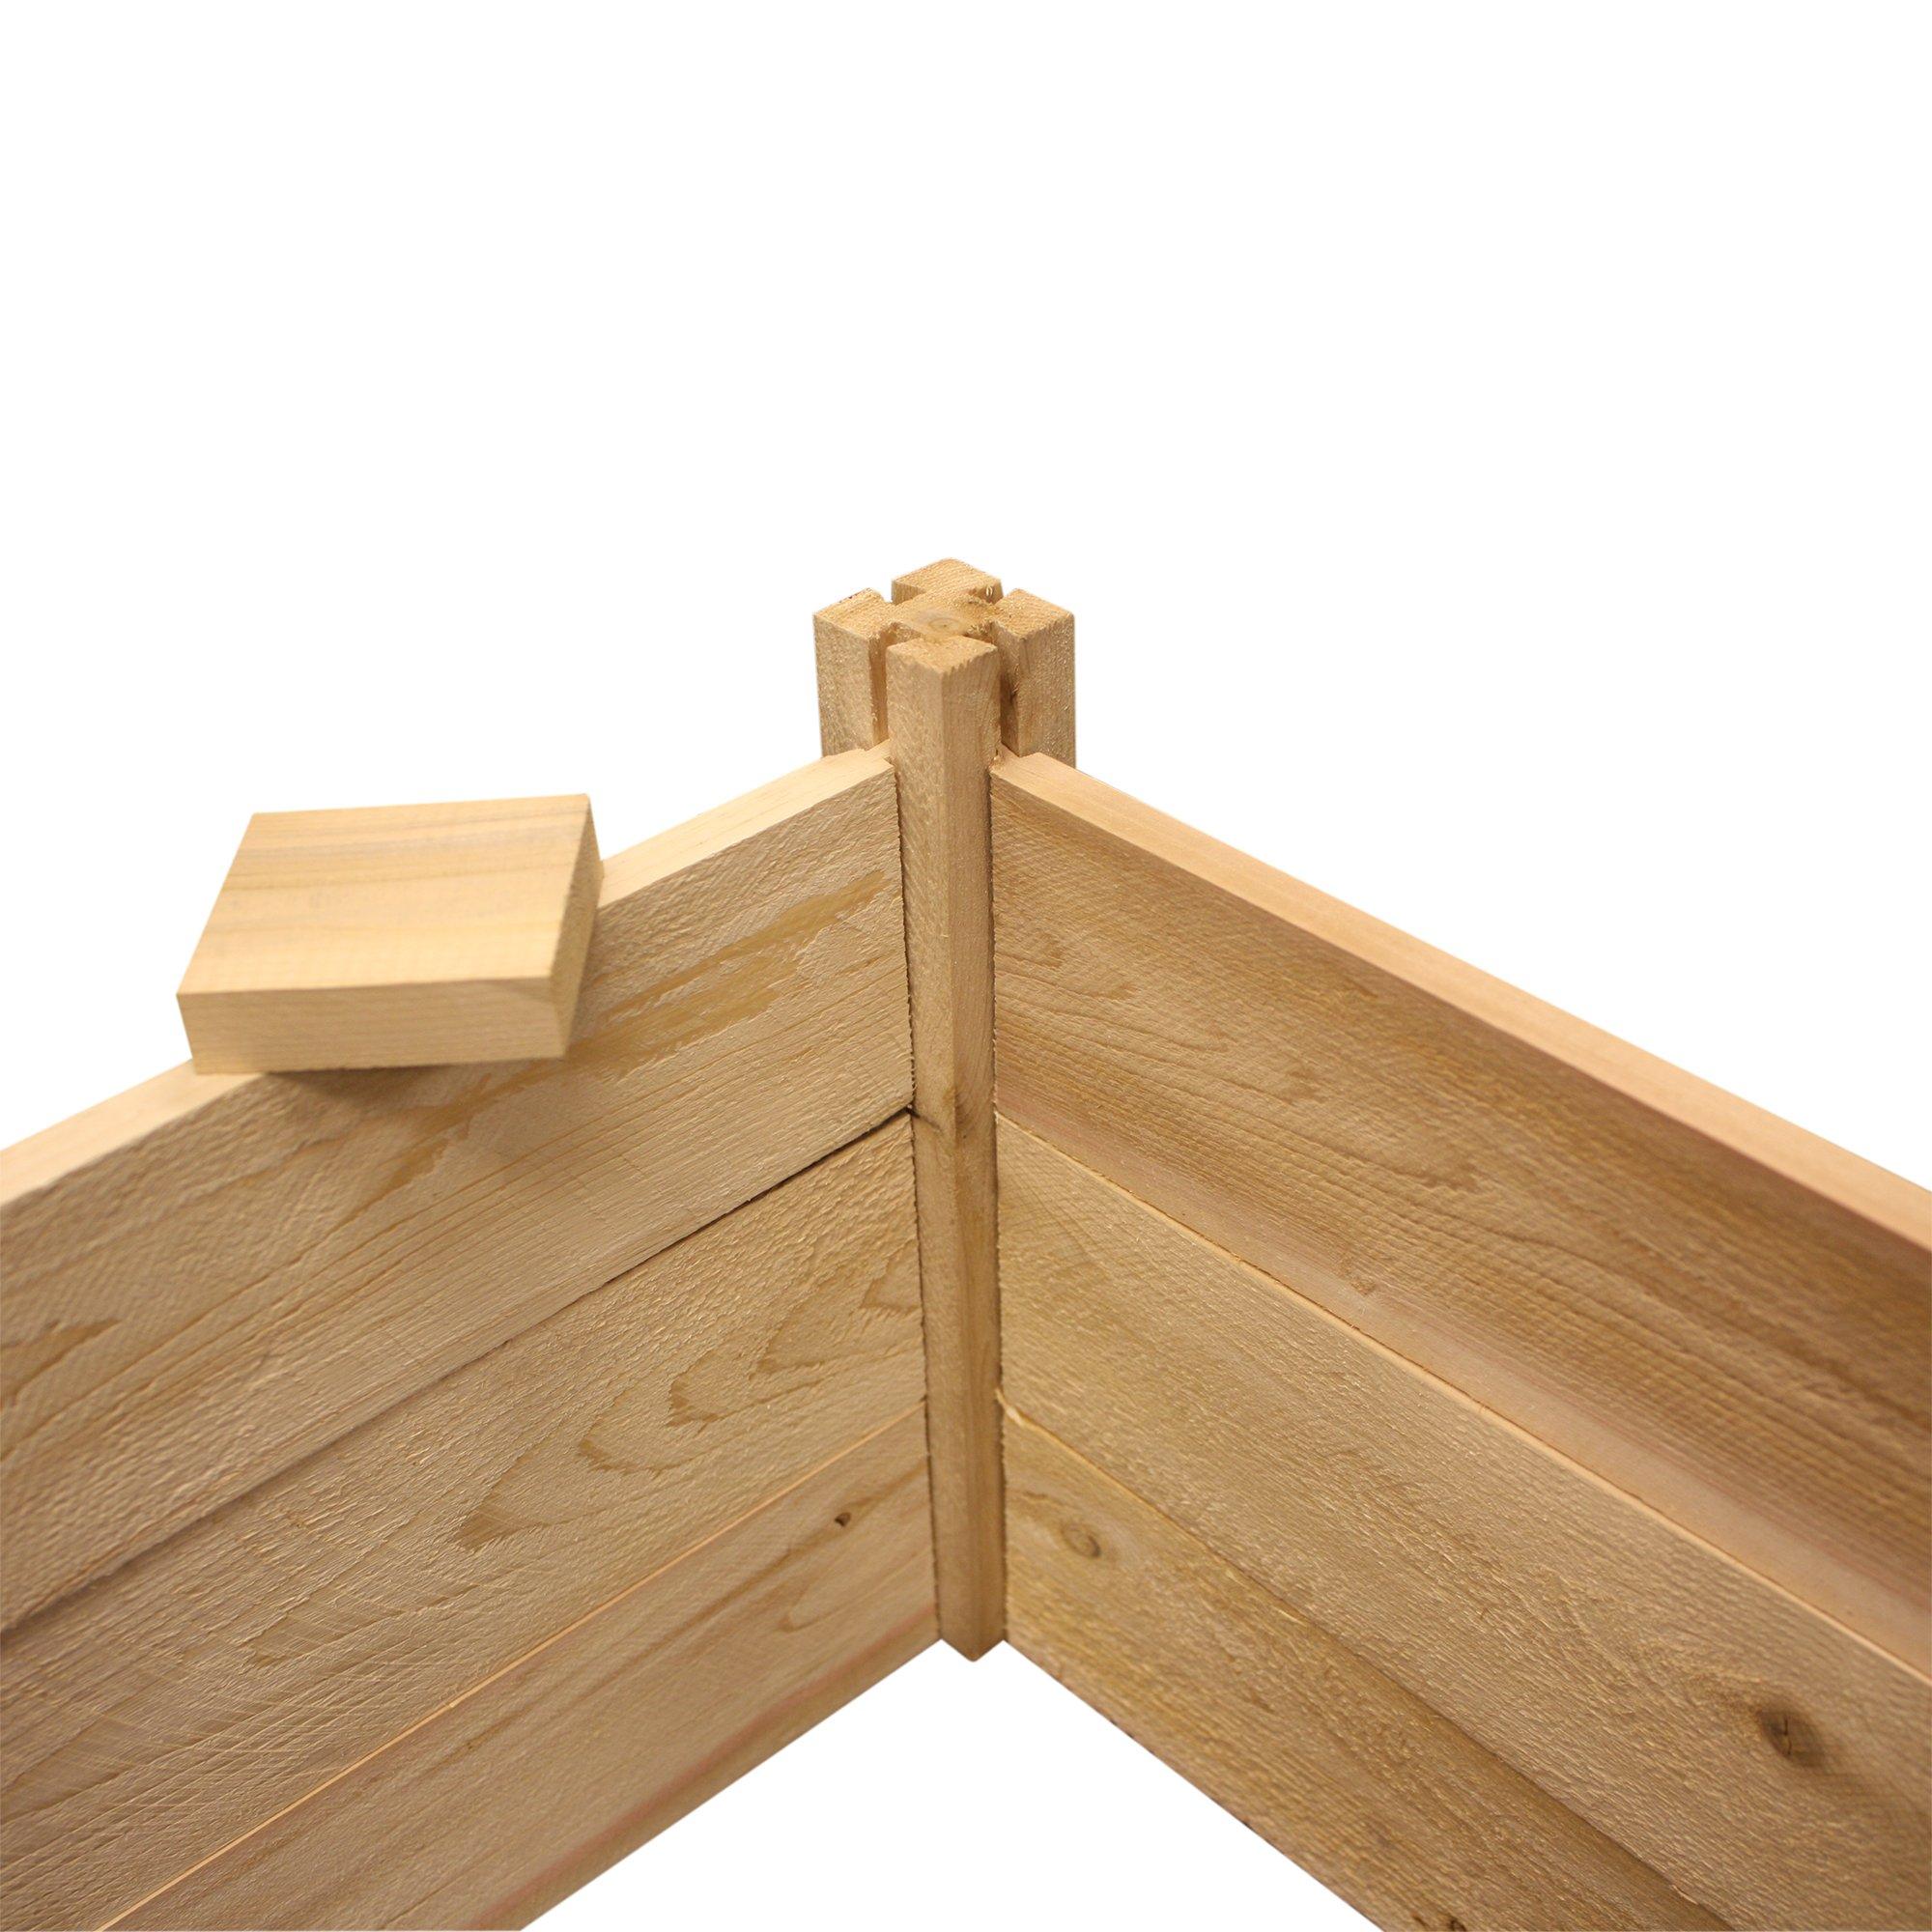 Best Value Cedar Raised Garden Bed Planter 24\